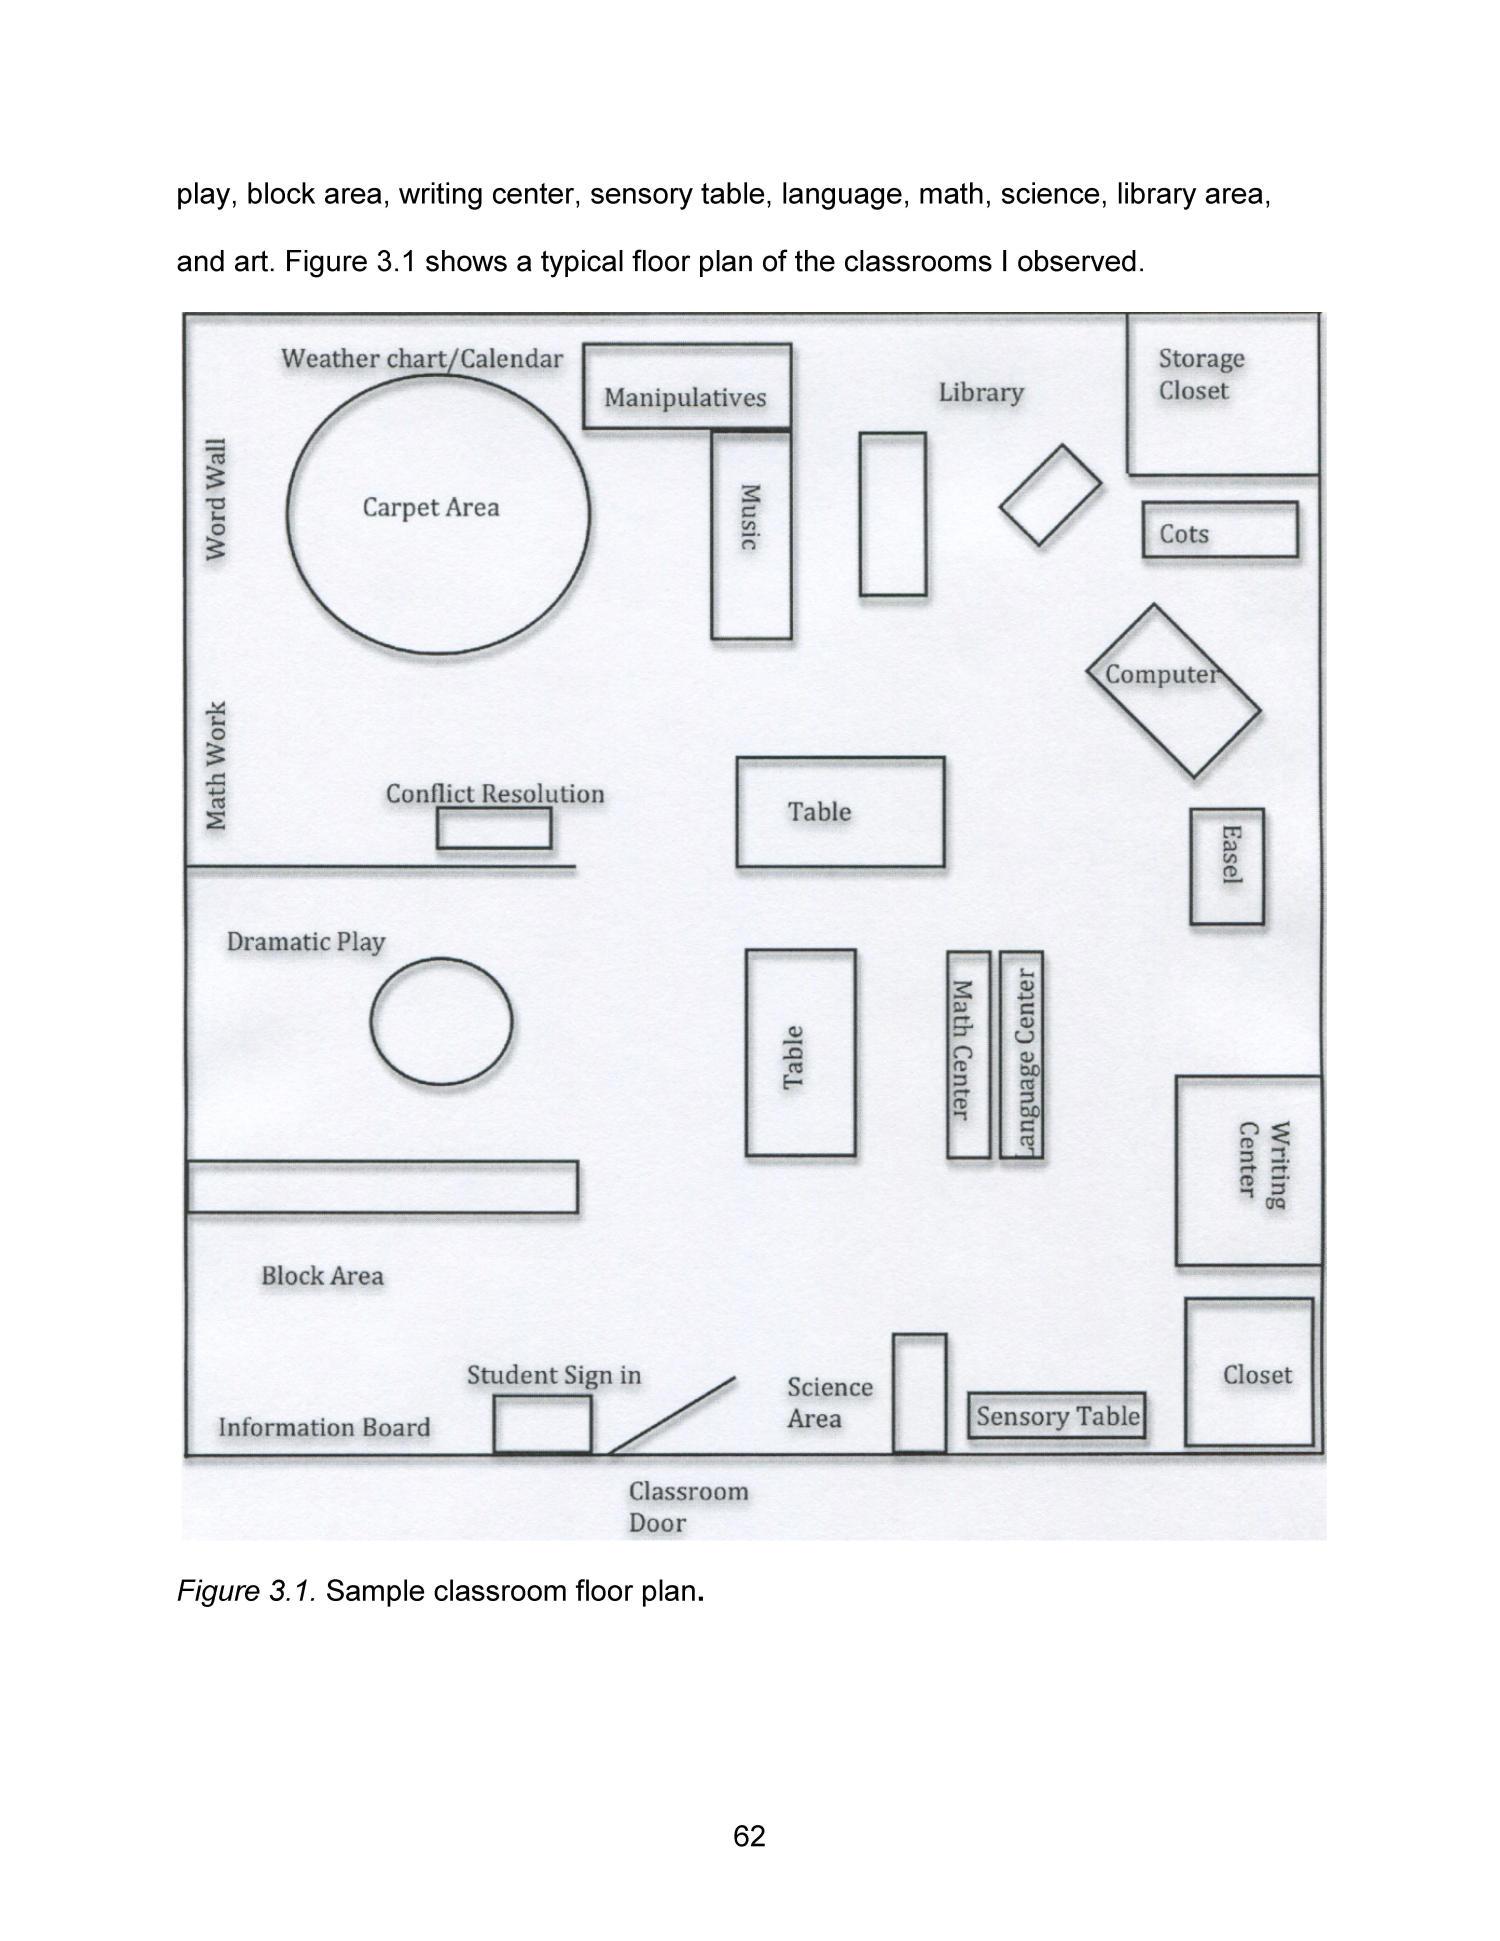 Classroom Floor Plan Design Tools ~ Preschool mathematics an examination of one program s